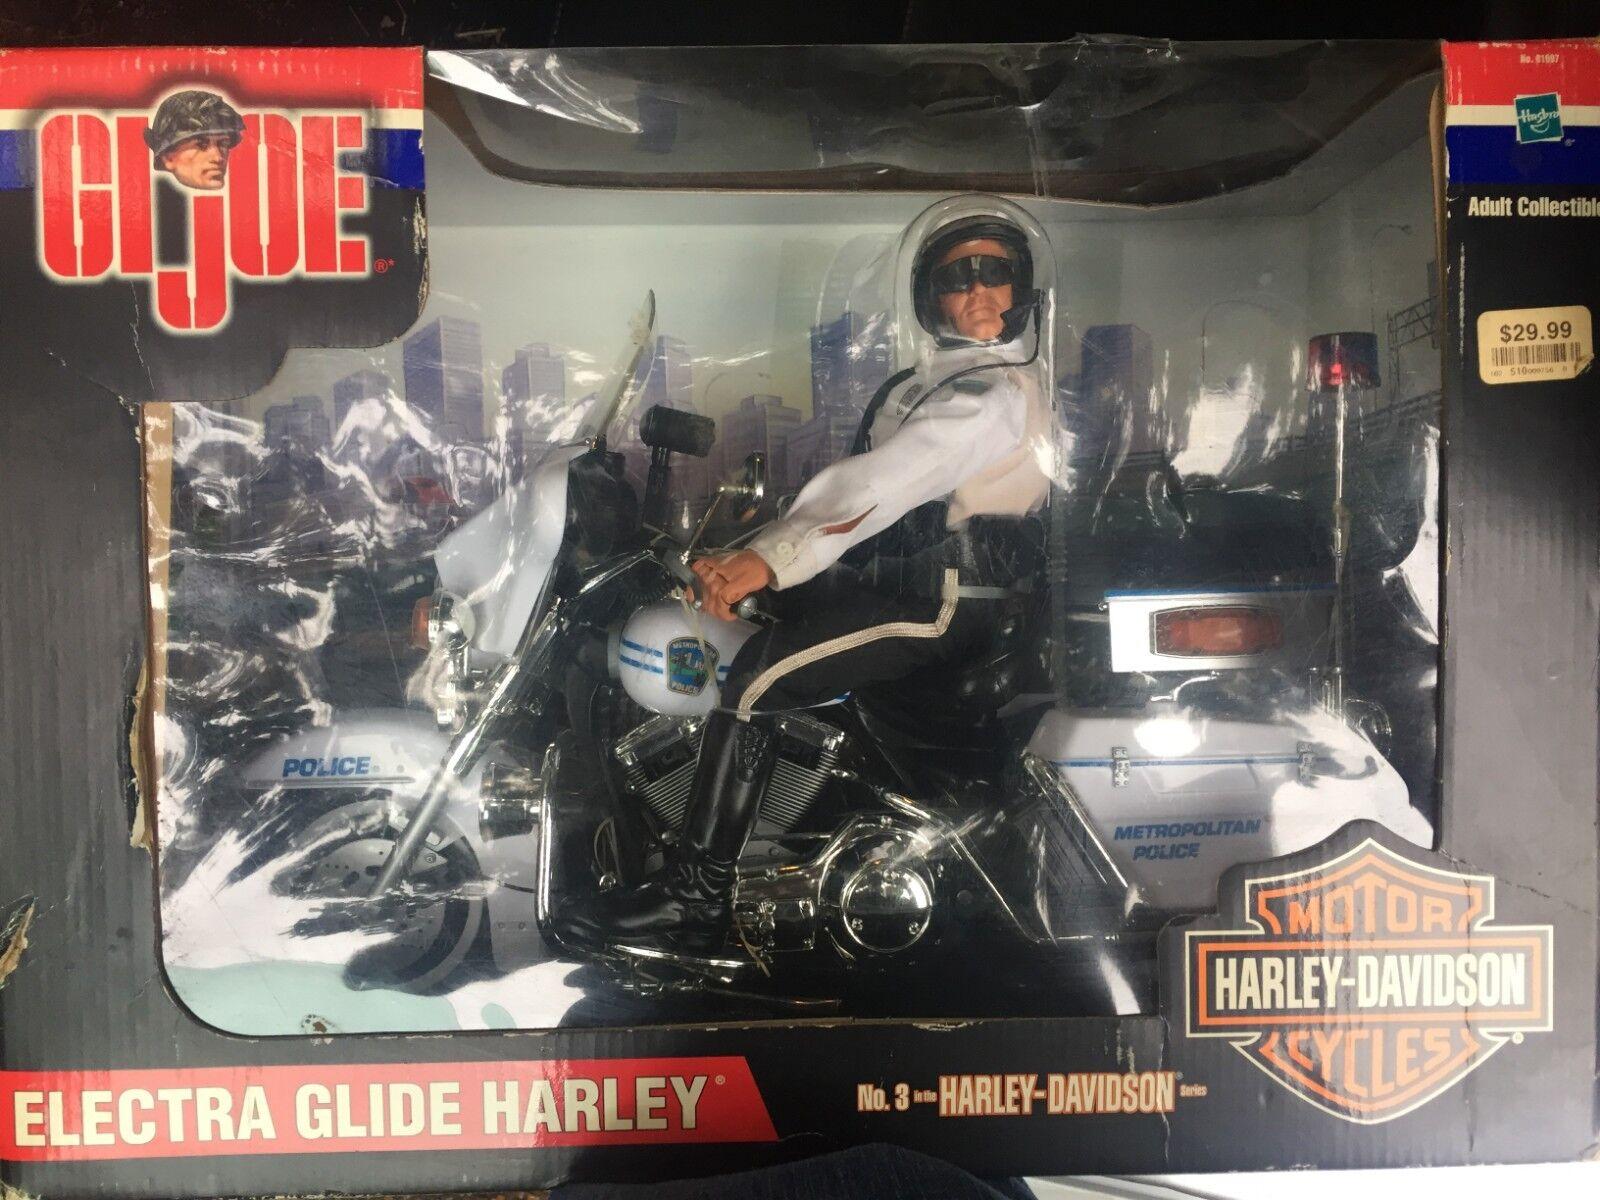 GI JOE Electra Glide Harley No. 3 3 3 Harley Davidson Metropolitan Police NEW ee9b7d